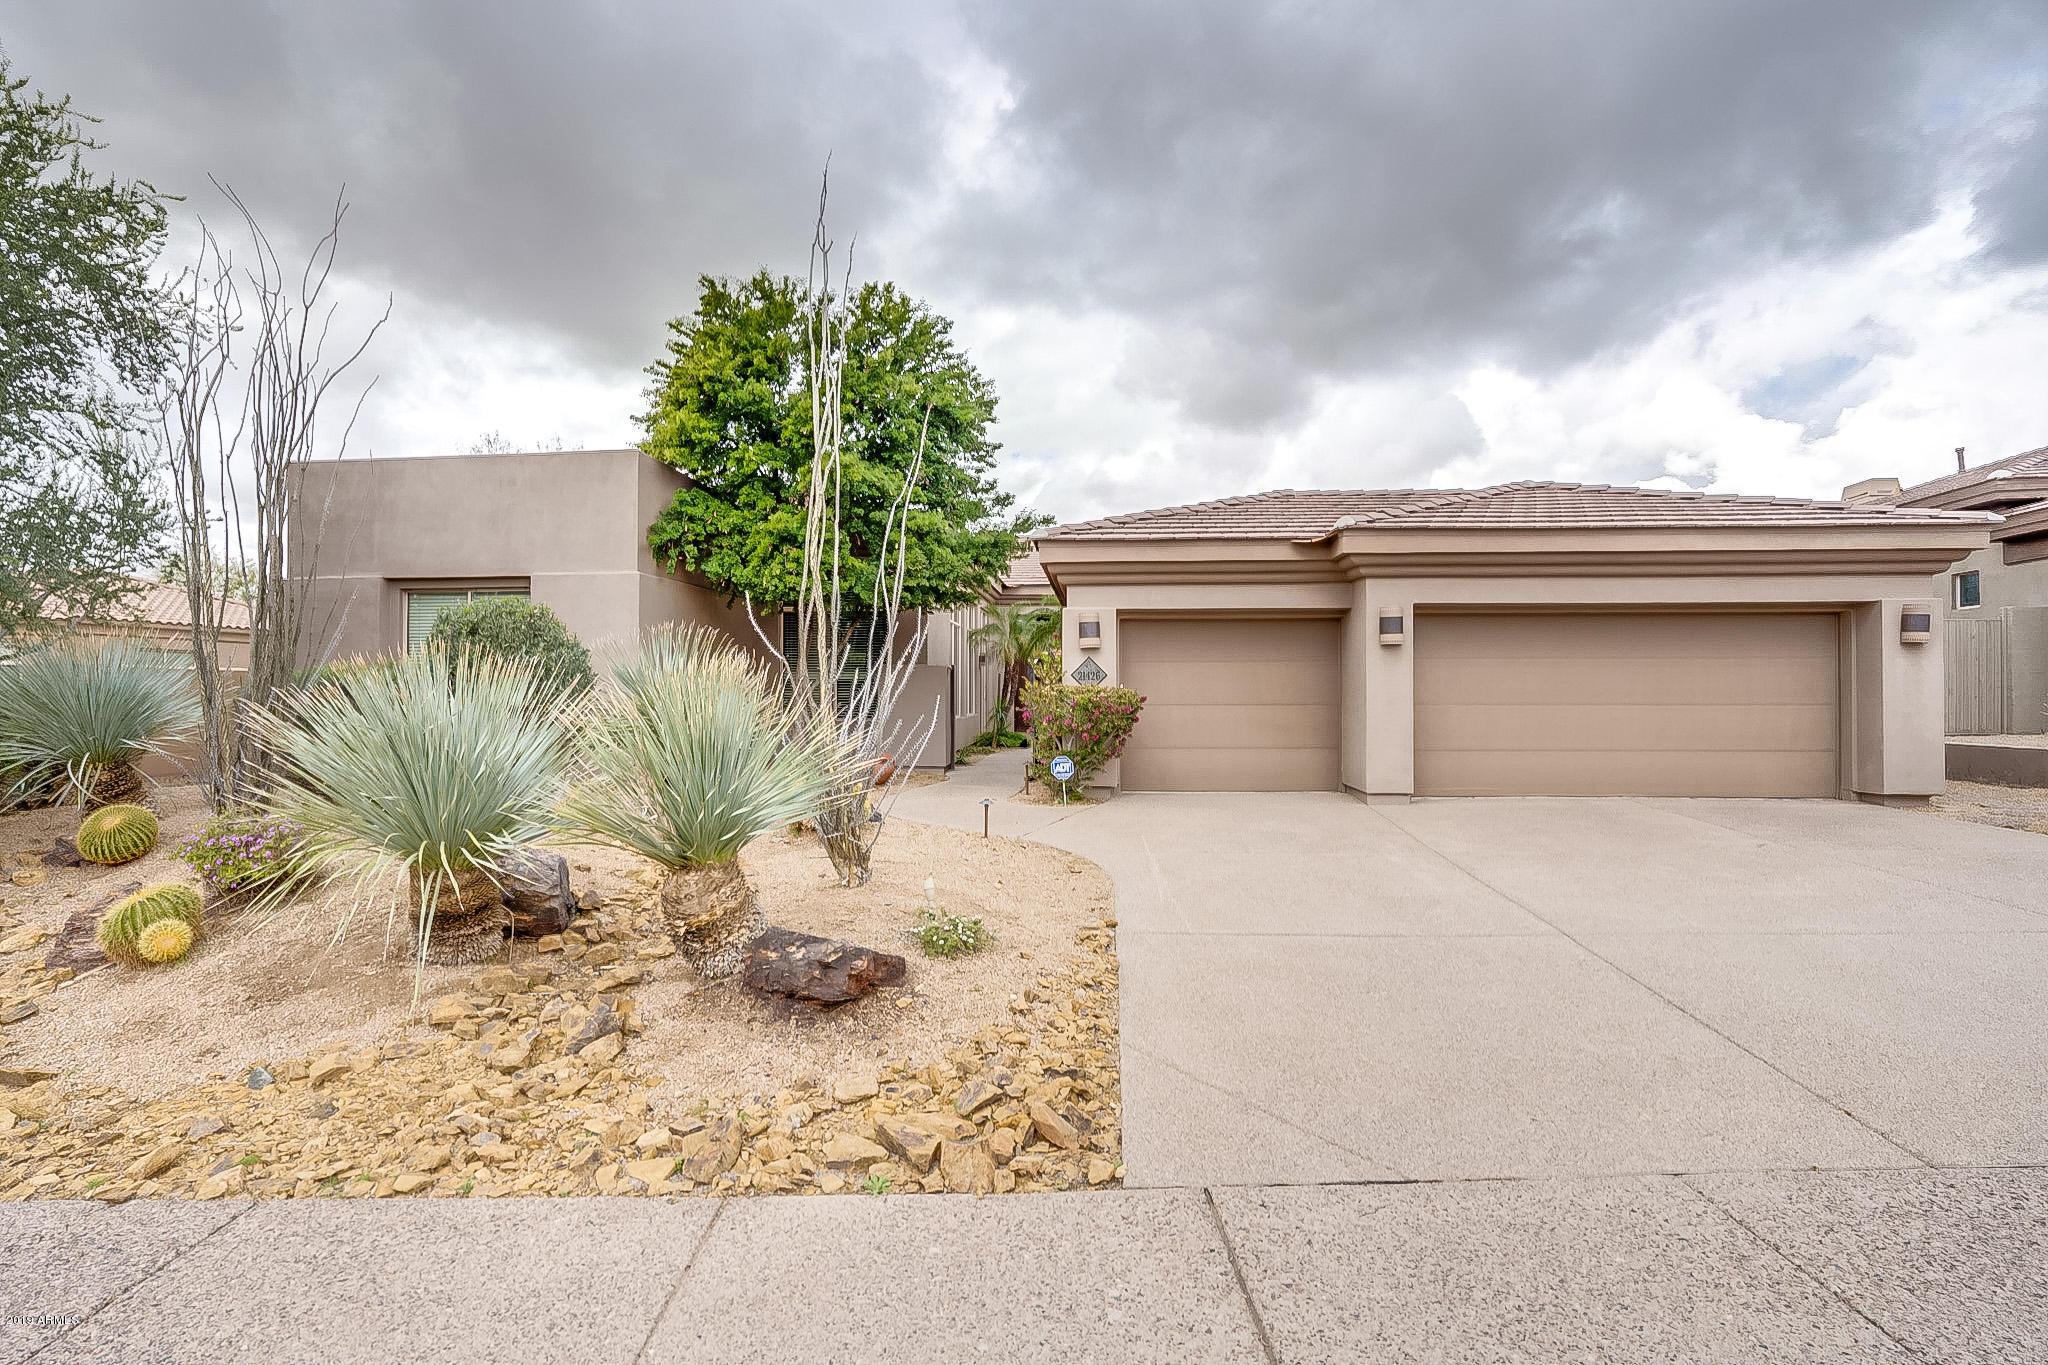 Photo of 21426 N 78TH Street, Scottsdale, AZ 85255